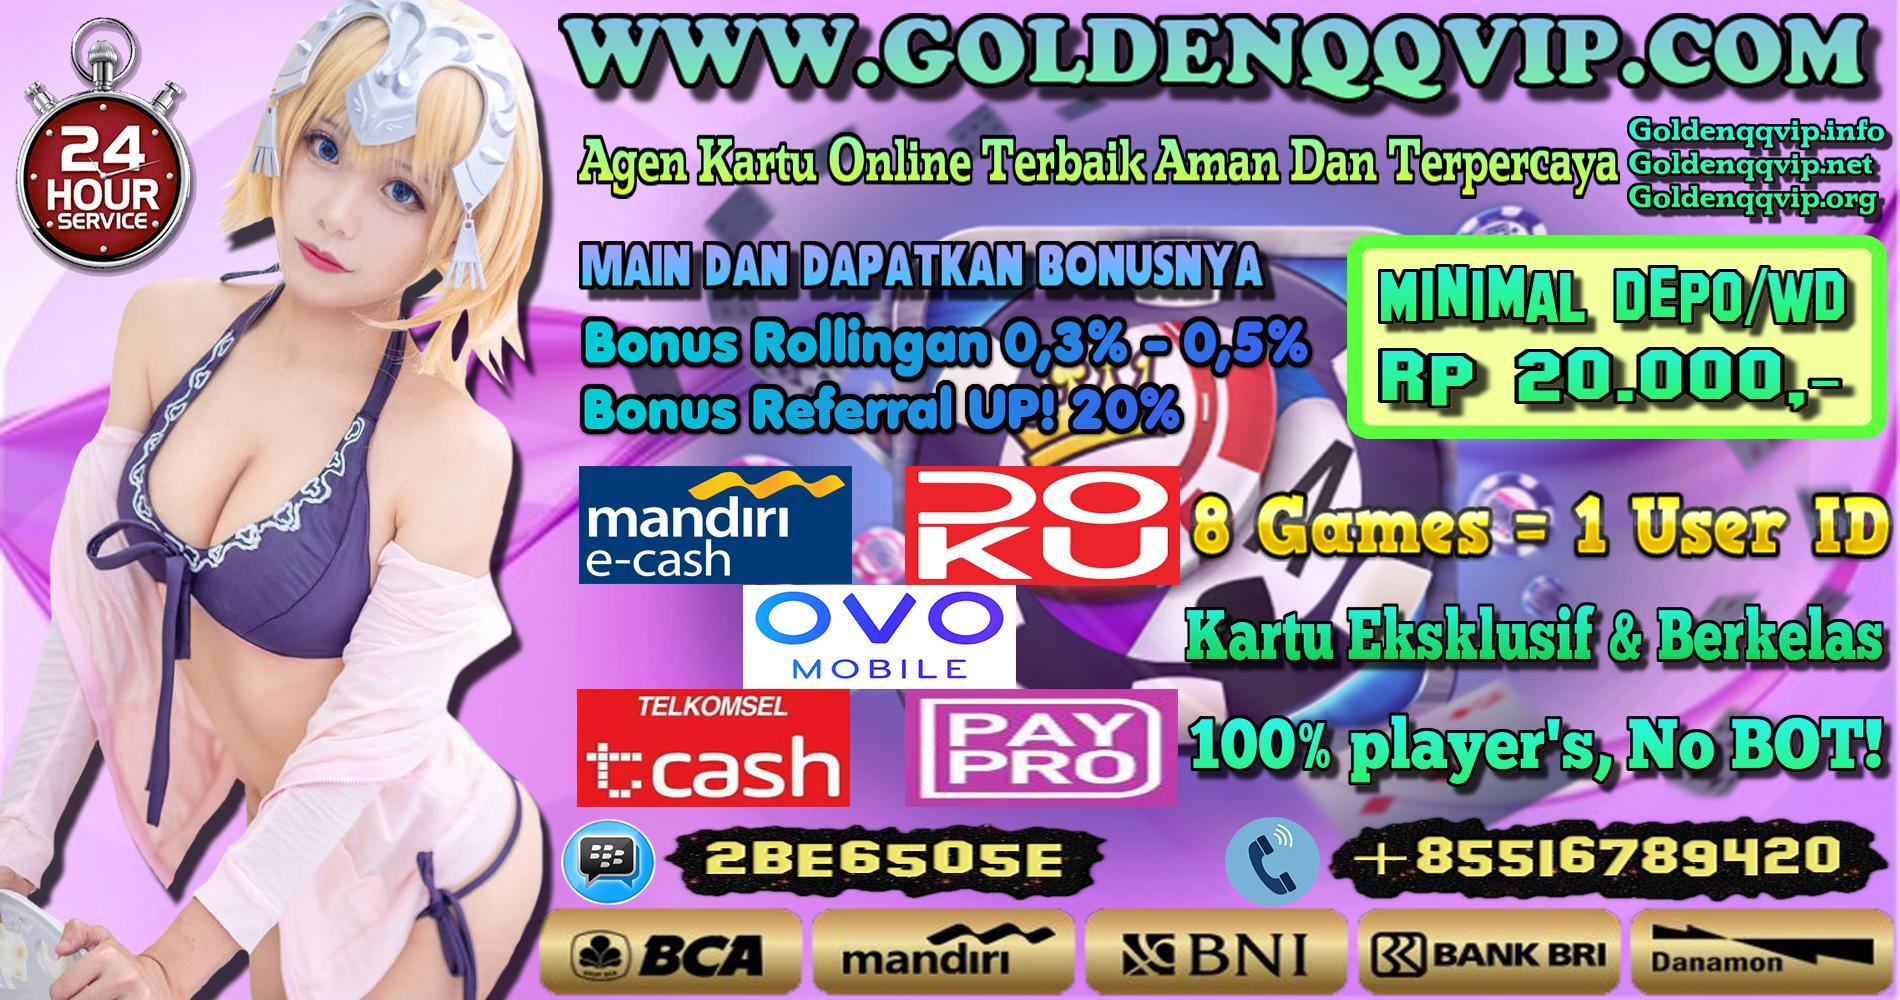 [Image: goldenqq9.jpg]